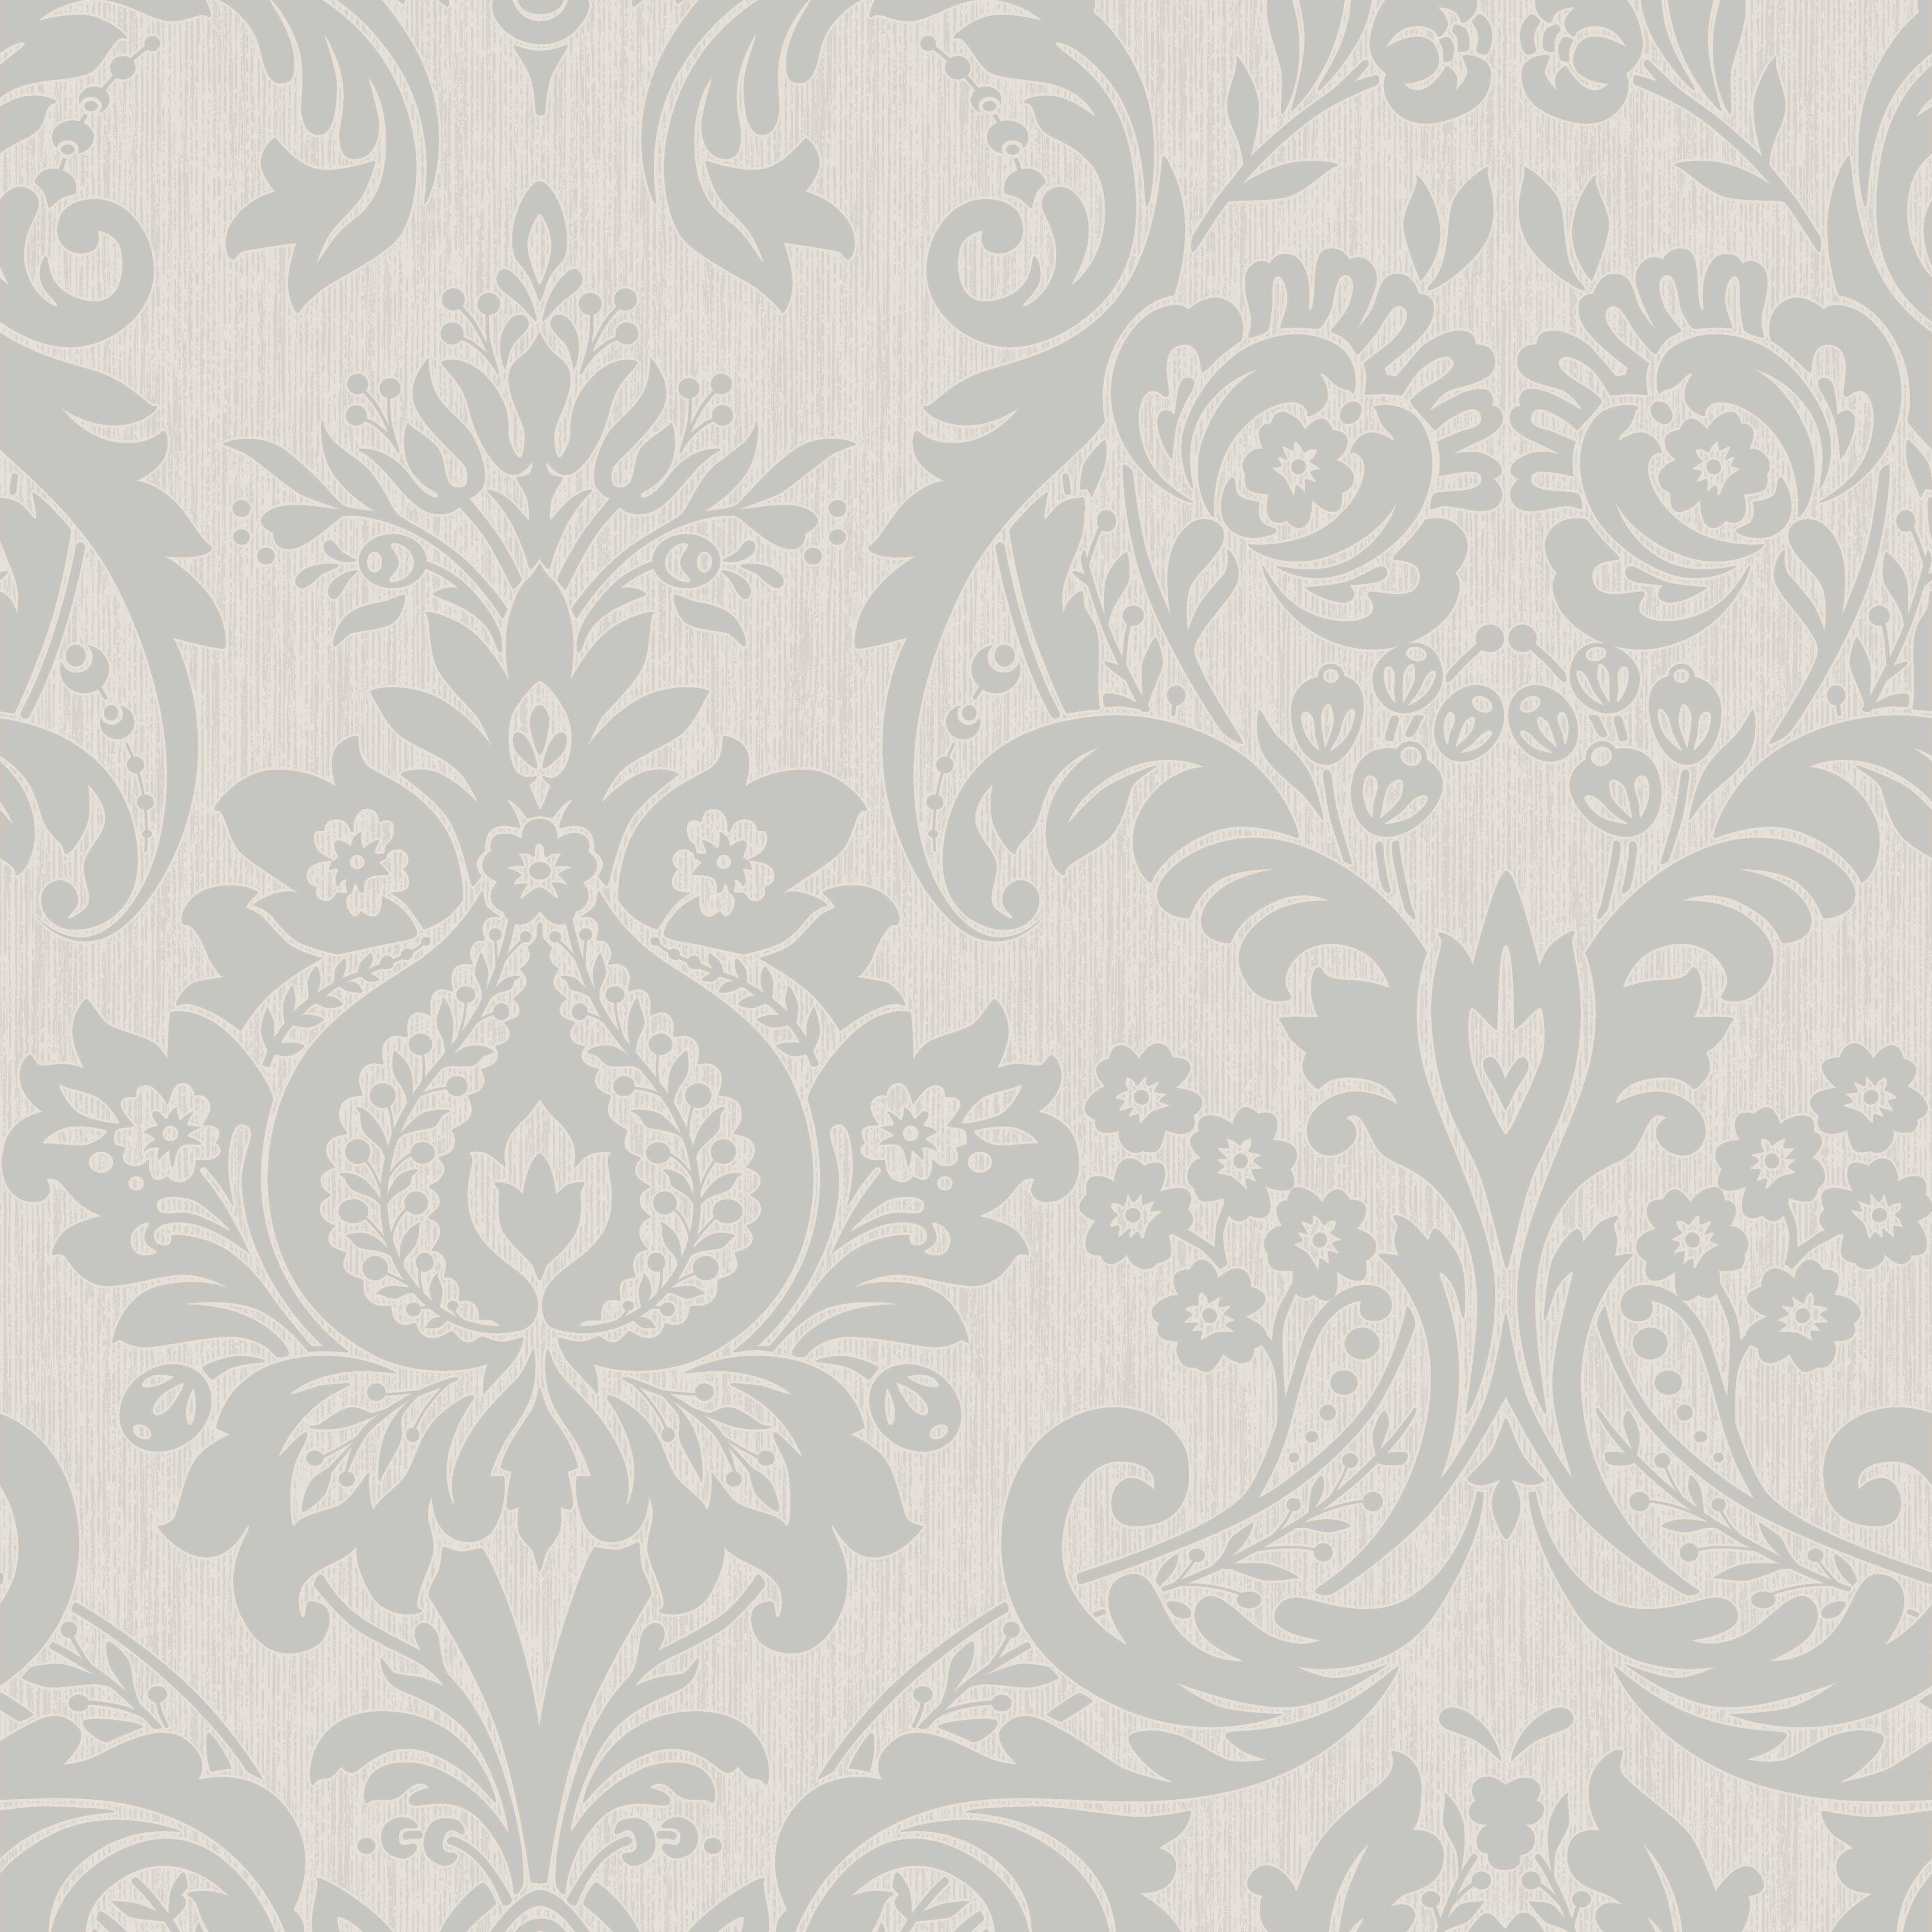 silver damask wallpaper - photo #12